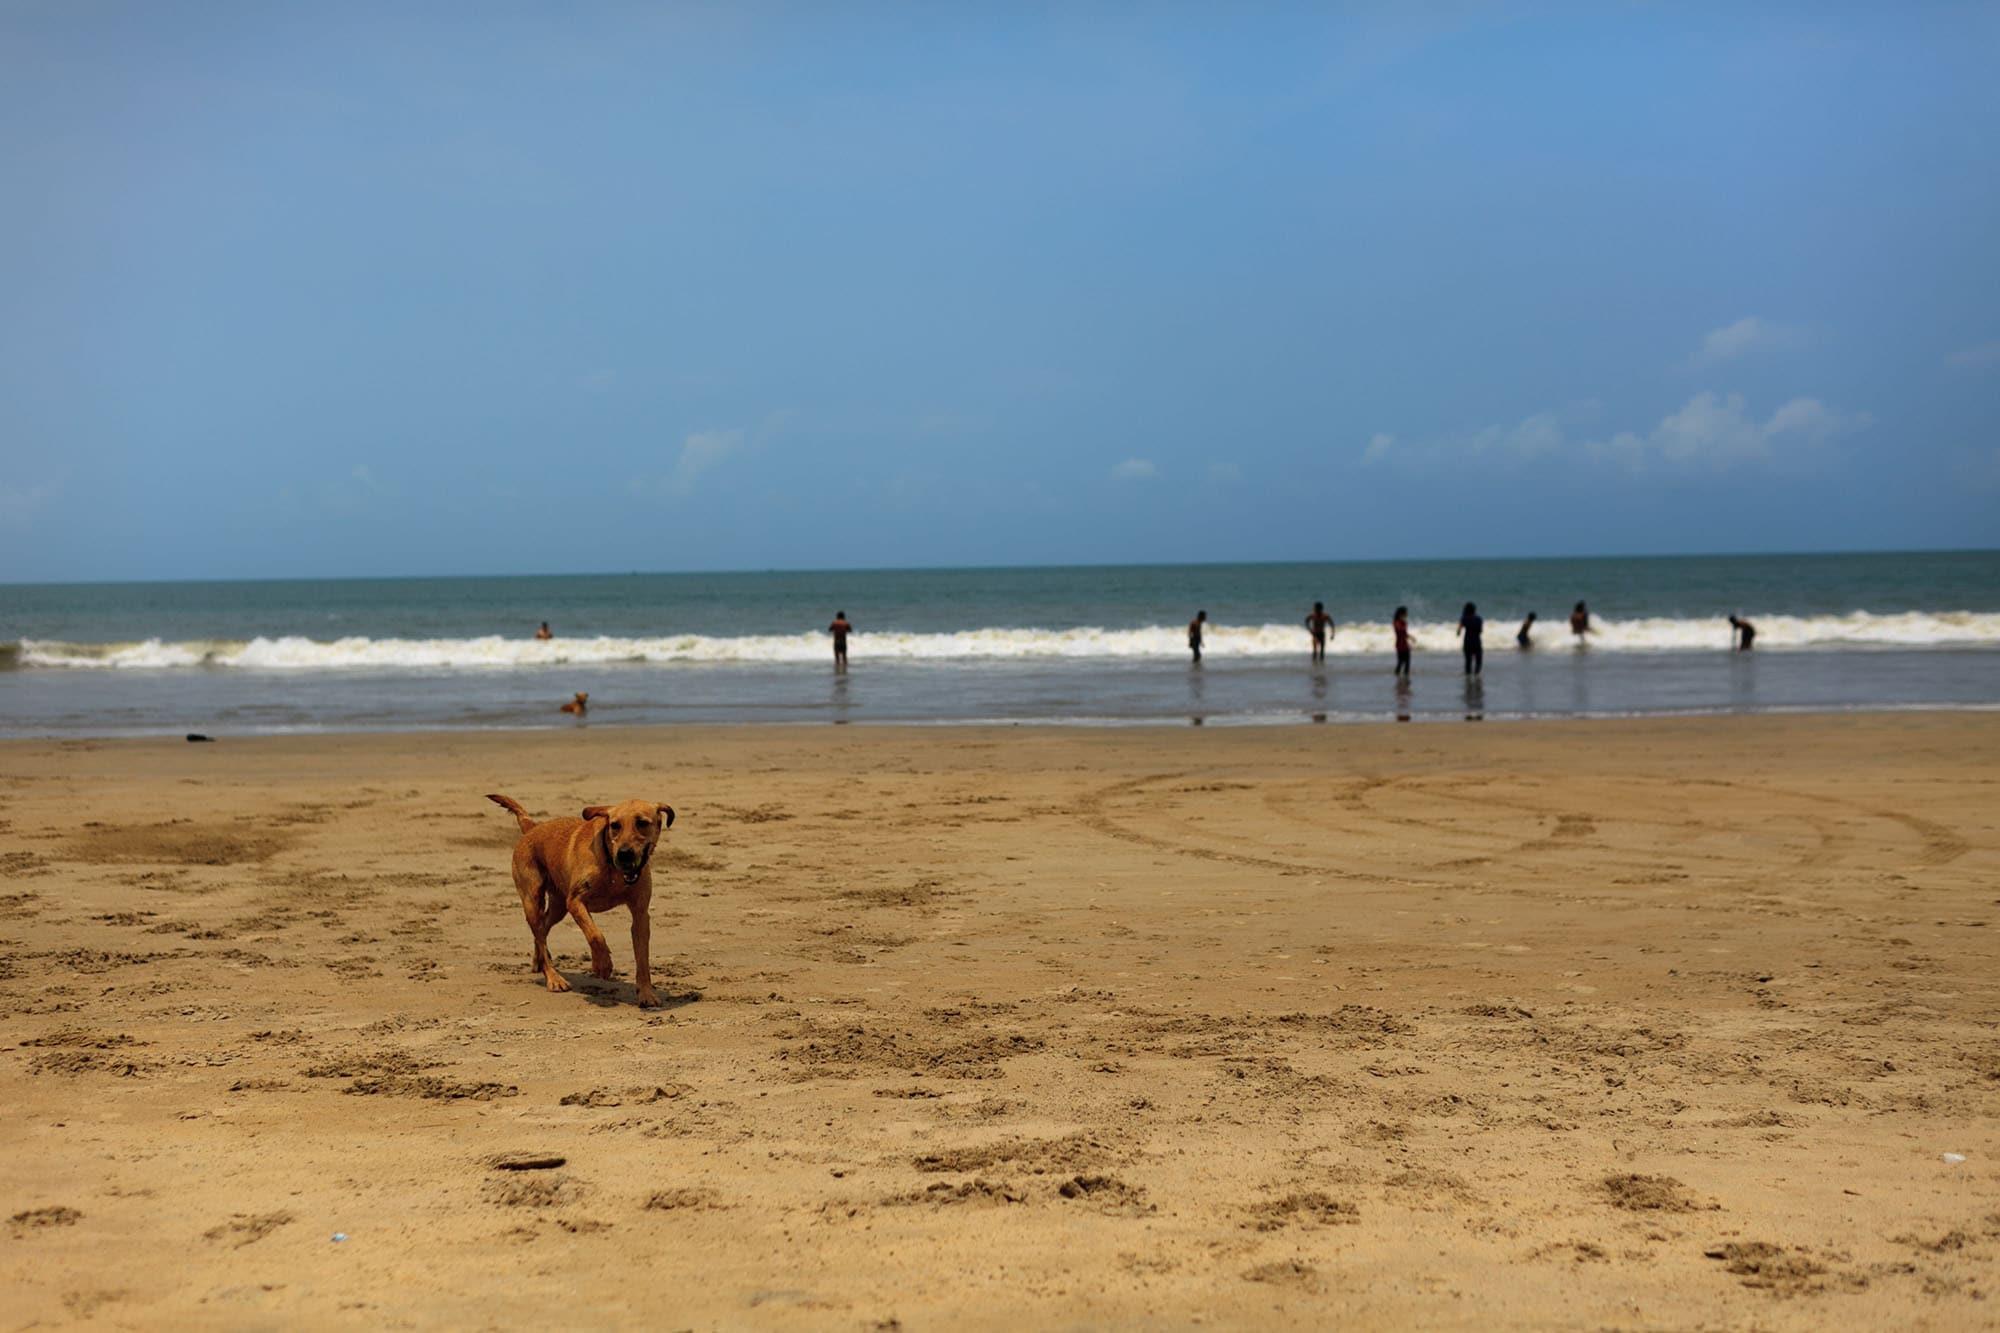 dog on the beach in Palolem, Goa, India.